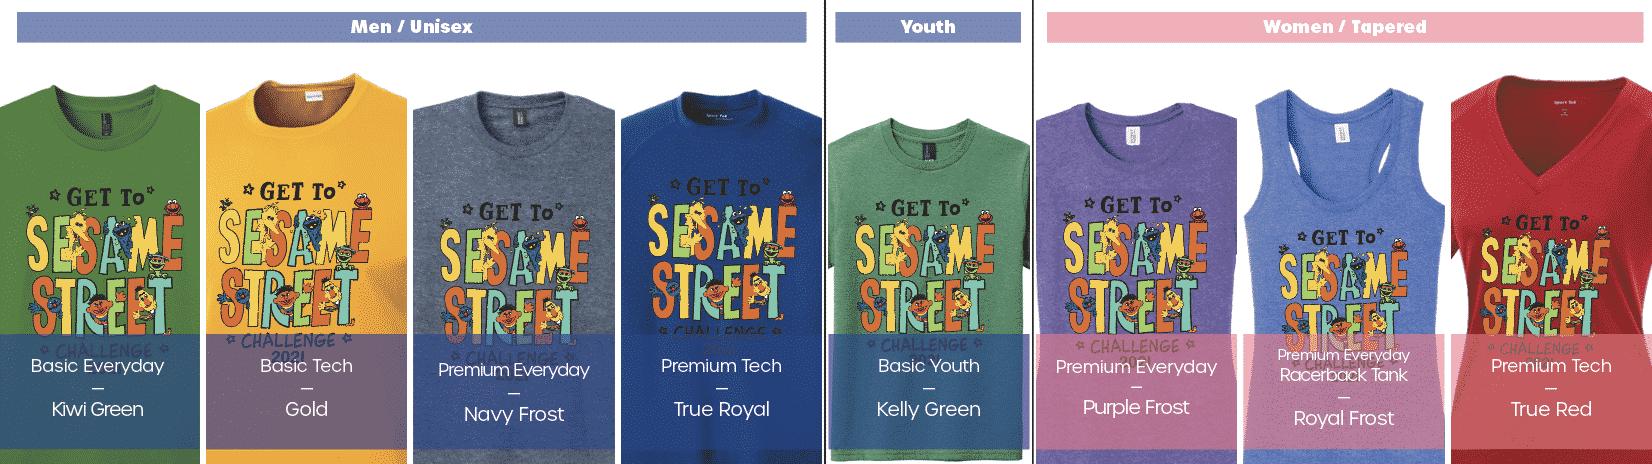 Get to Sesame Street Challenge Shirt Options